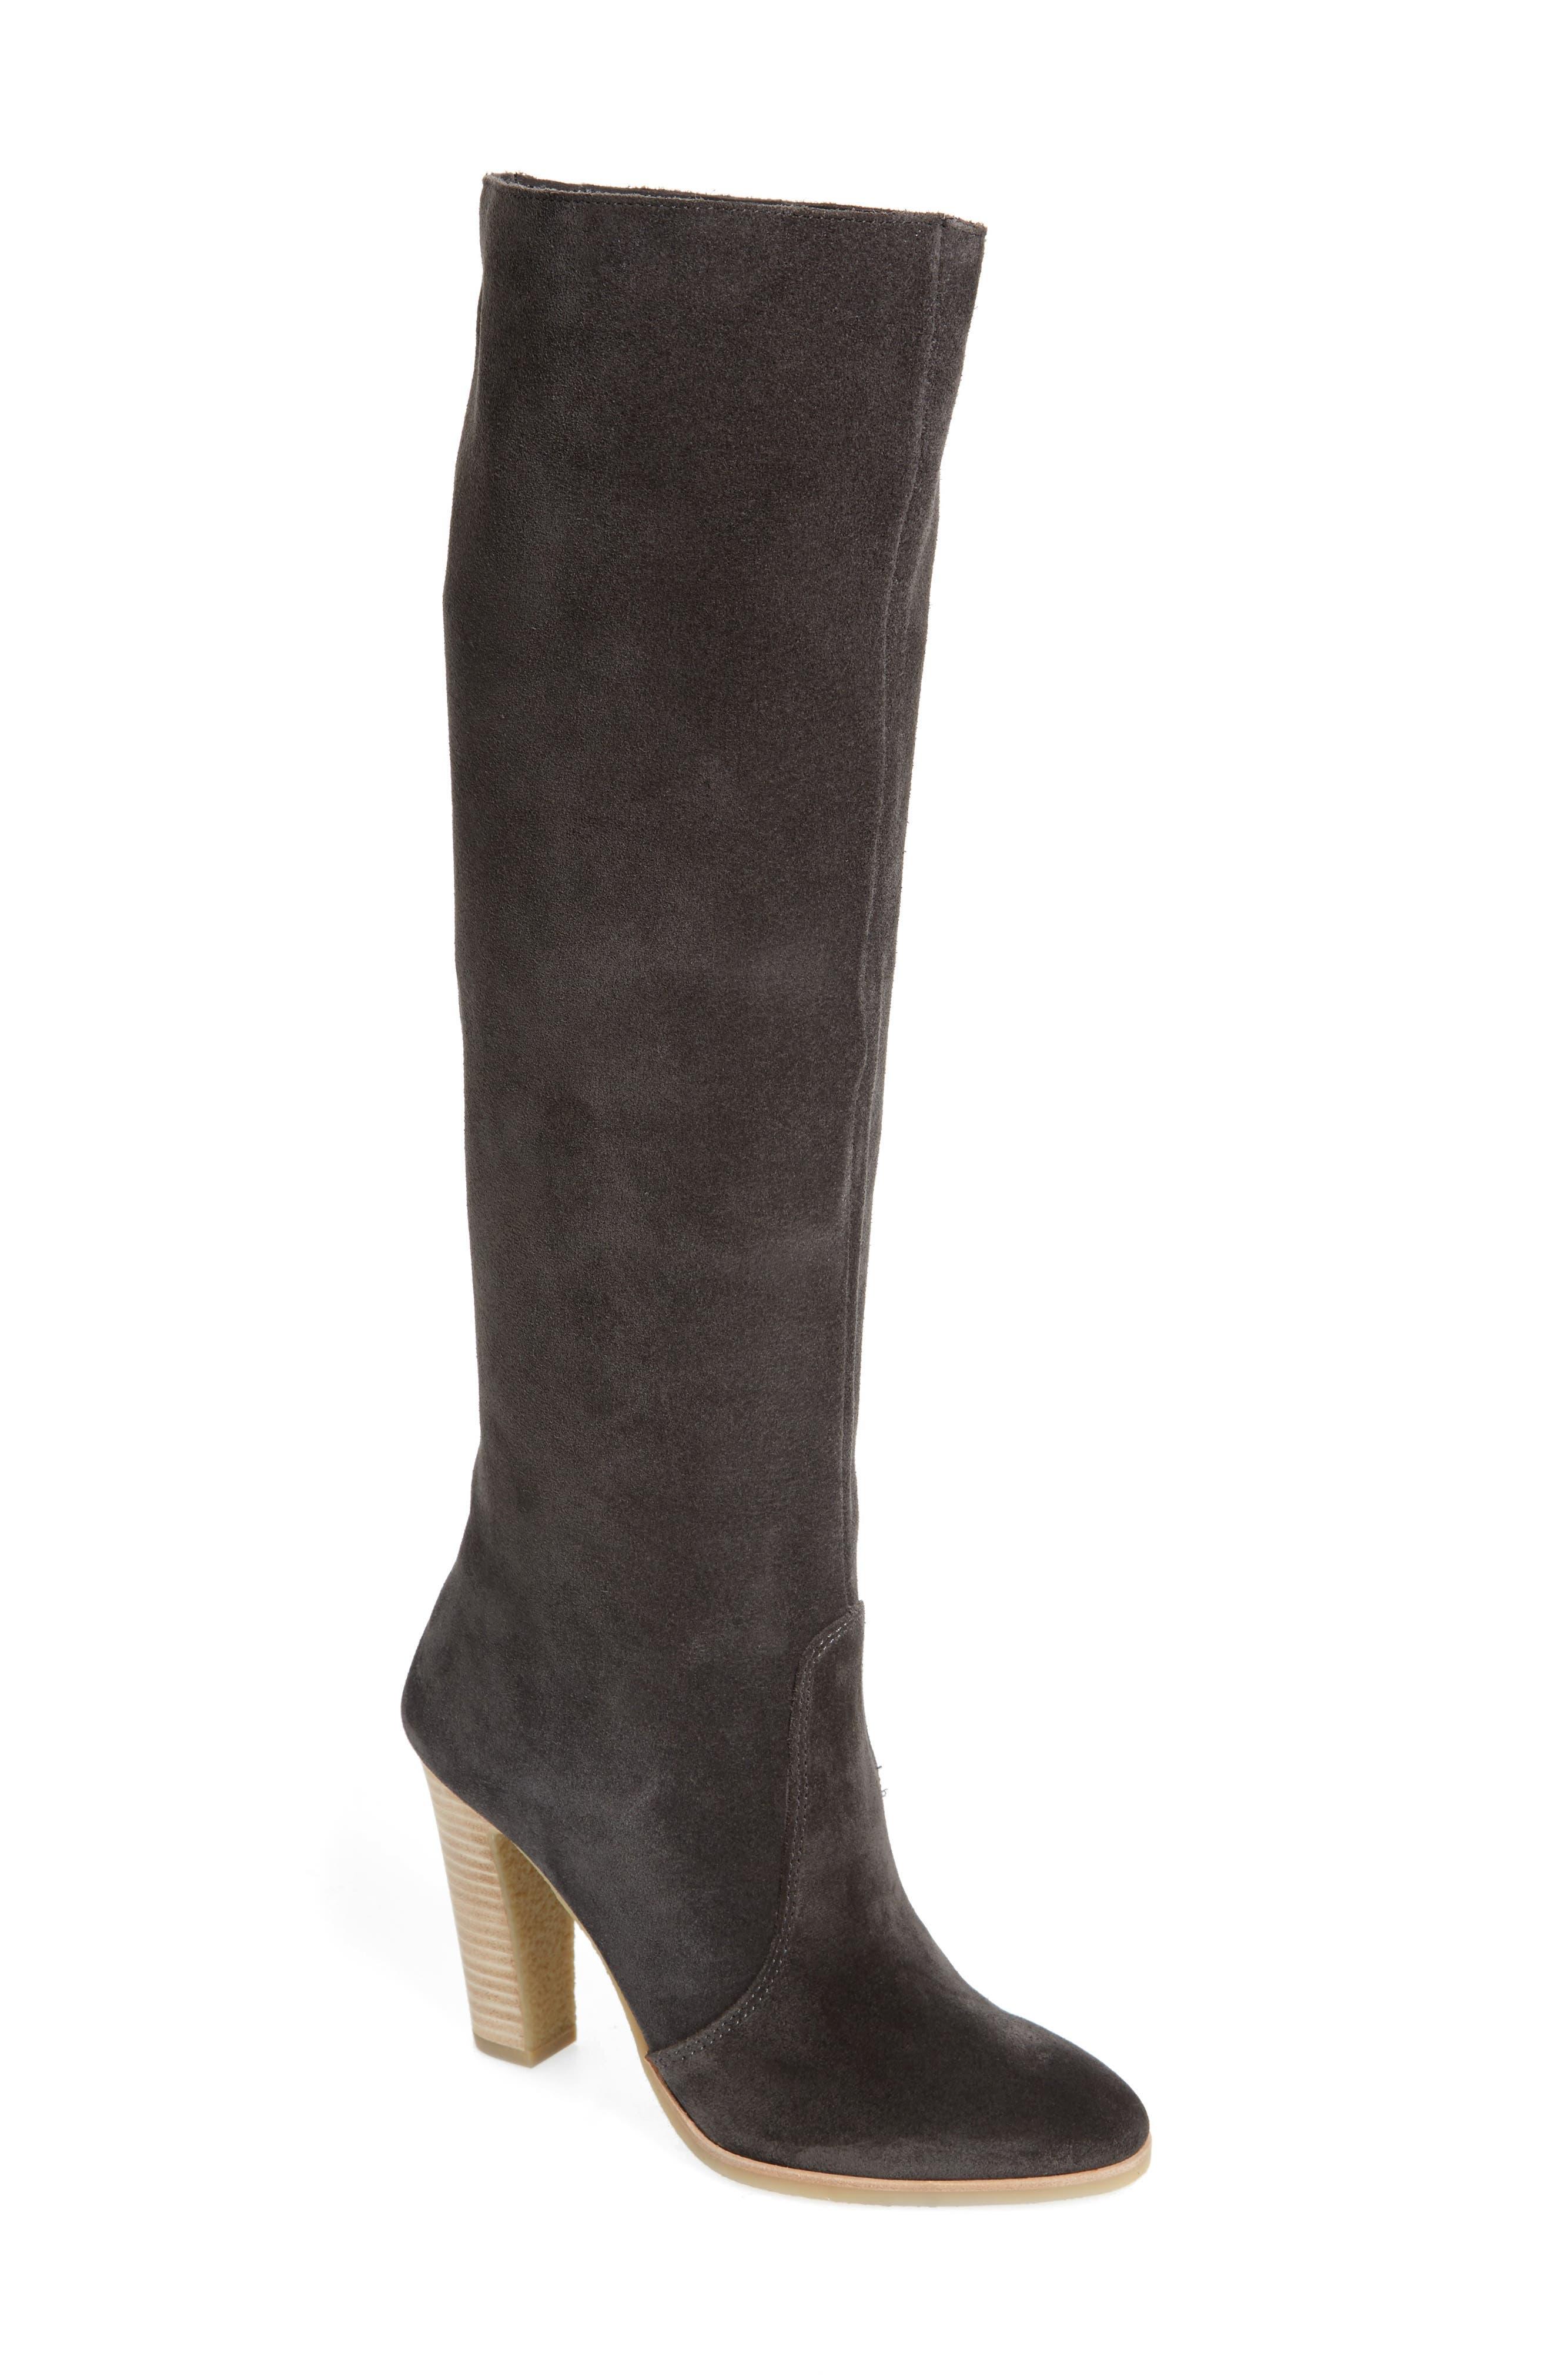 Celine Knee-High Boot,                             Main thumbnail 1, color,                             020